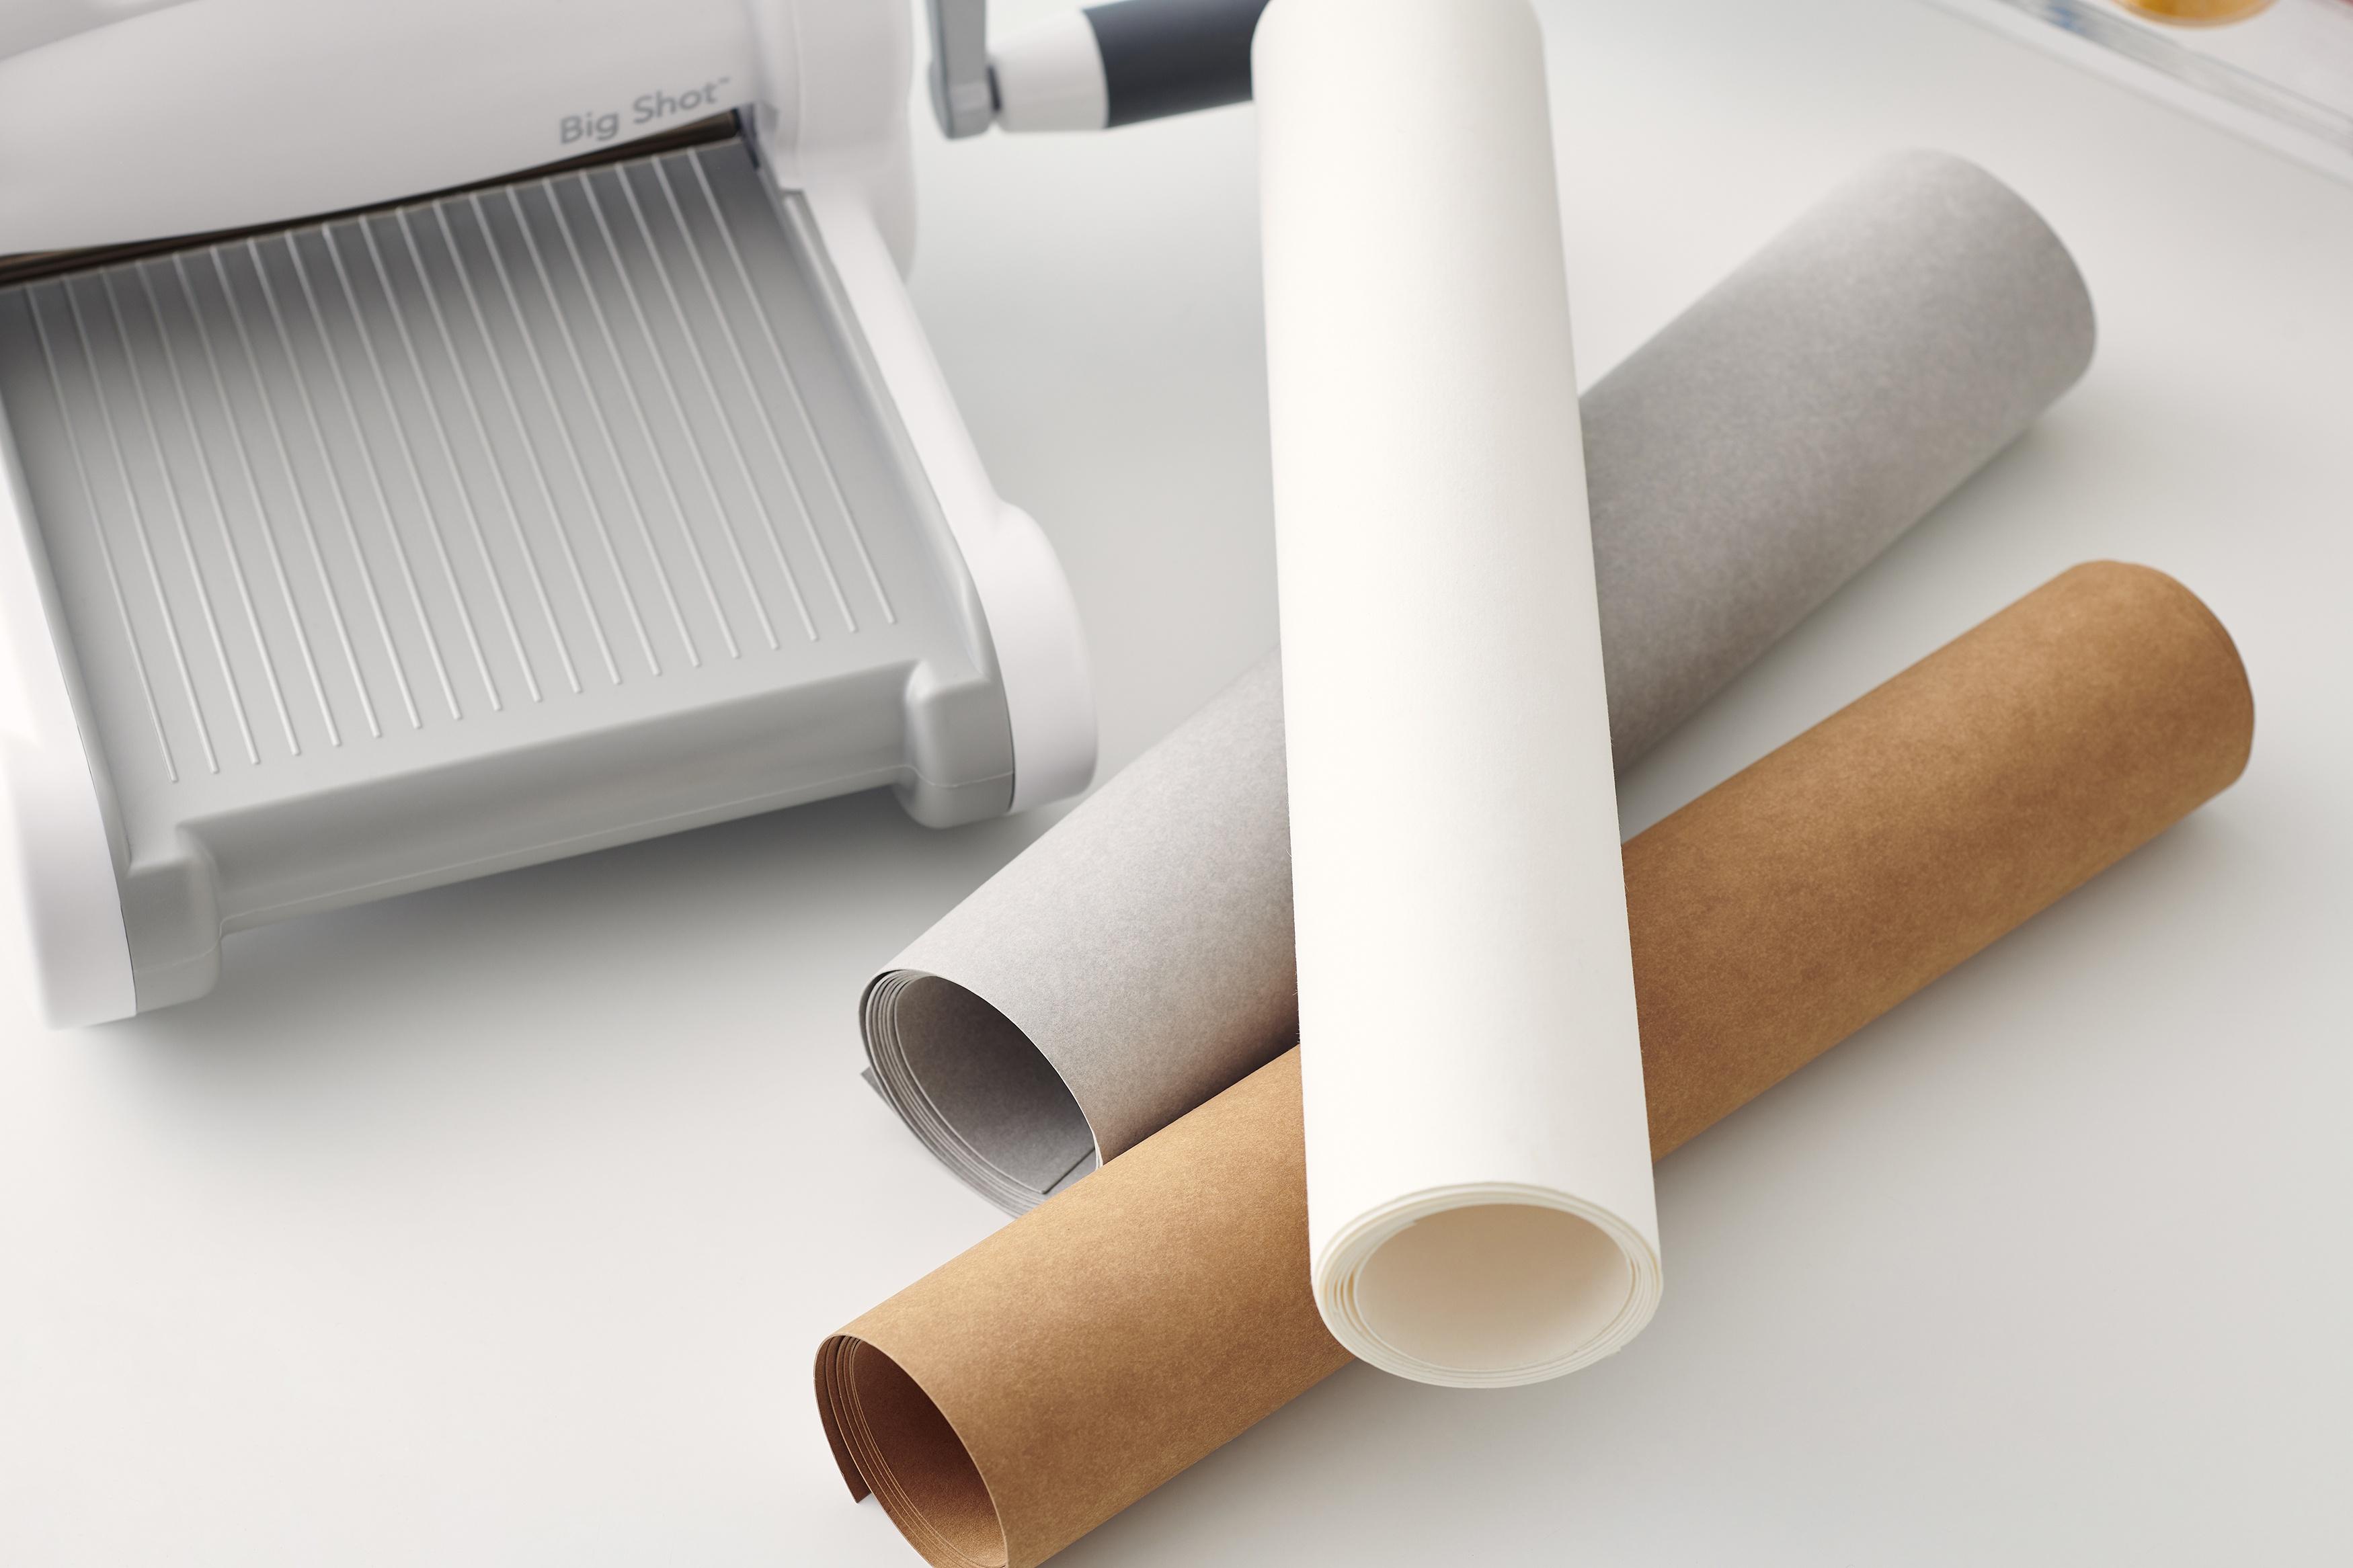 Sizzix Surfacez Texture Roll 12X48-Tan